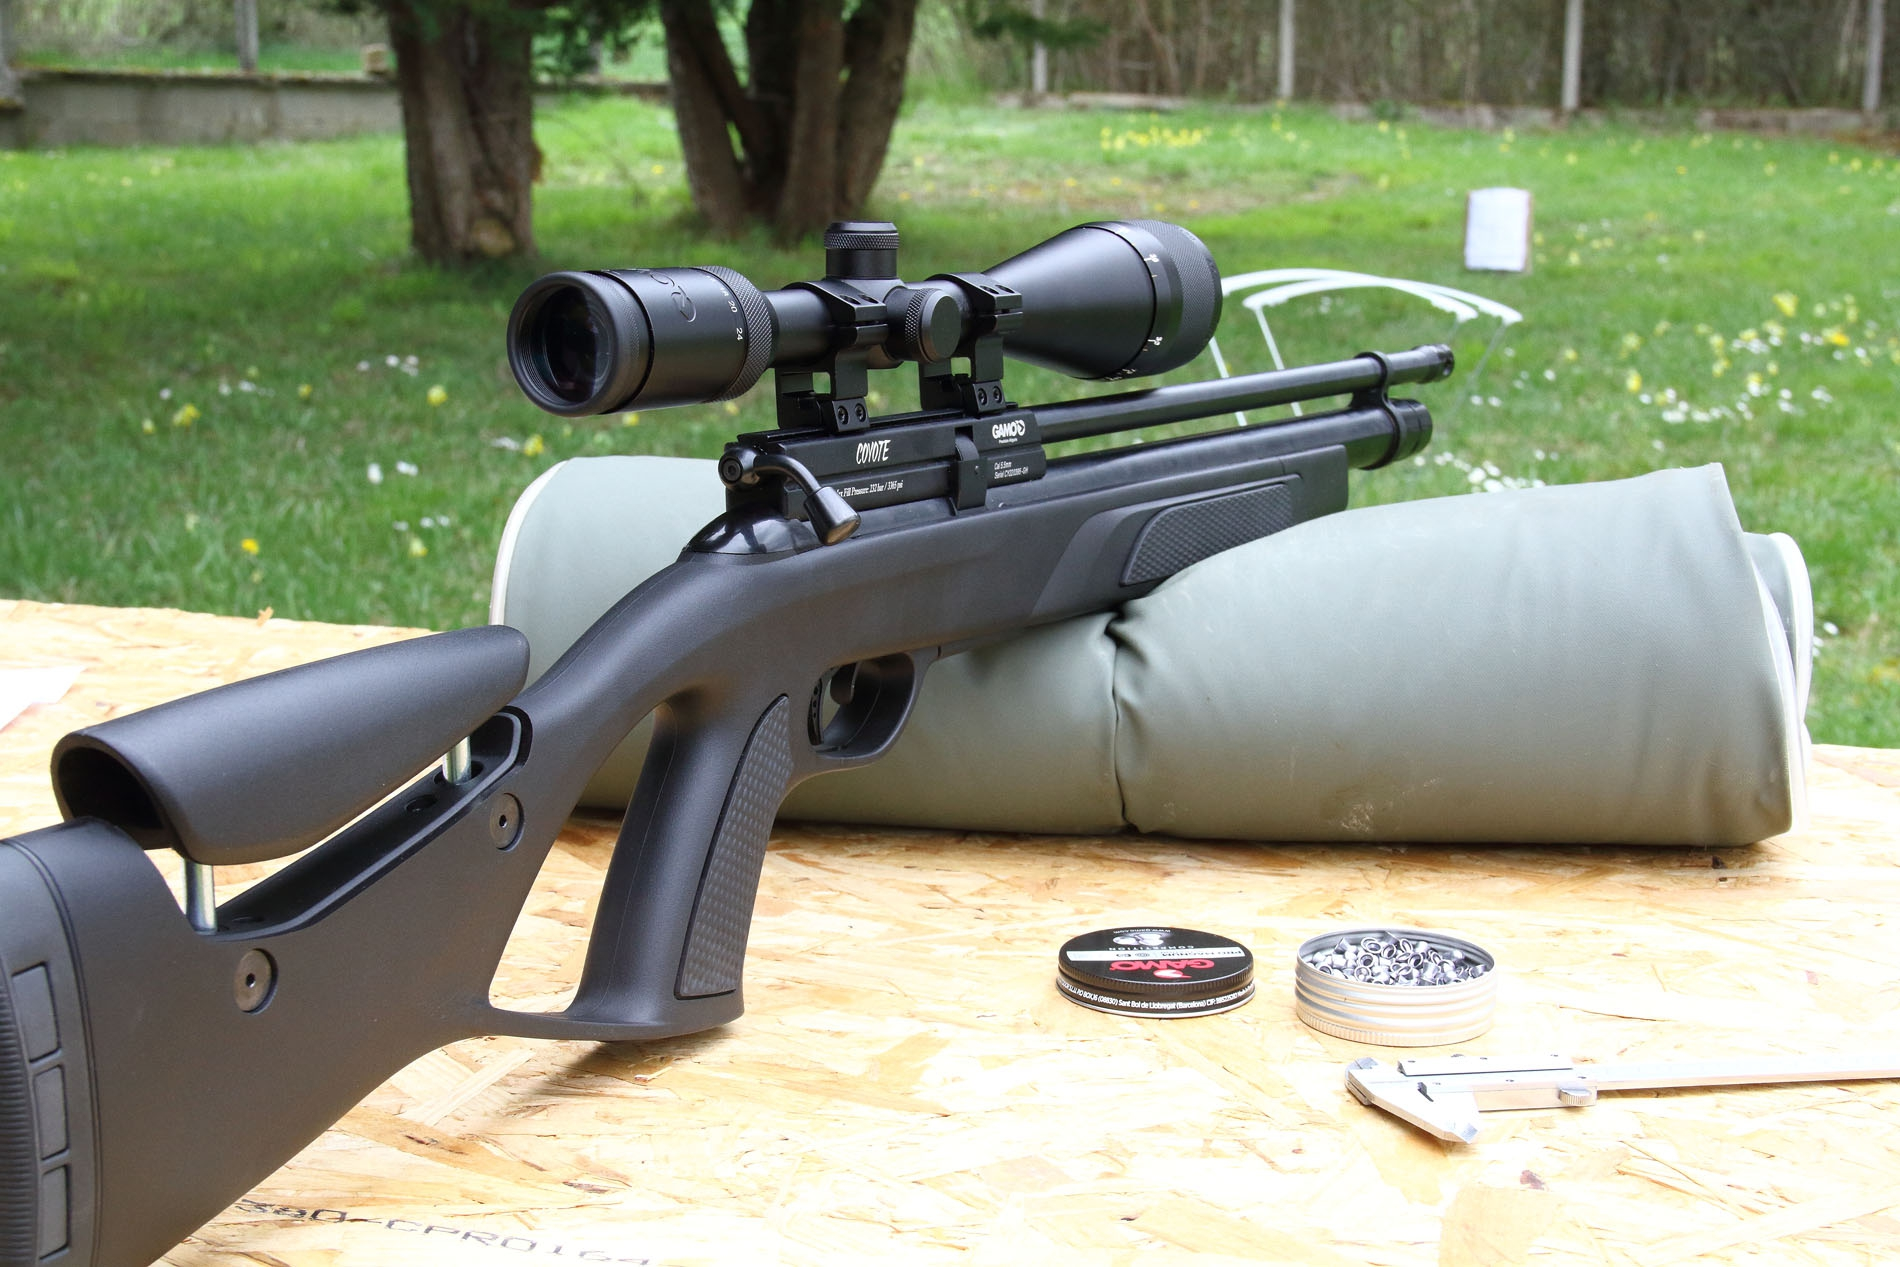 La Carabine Gamo Test De Coyote trdCxhQs